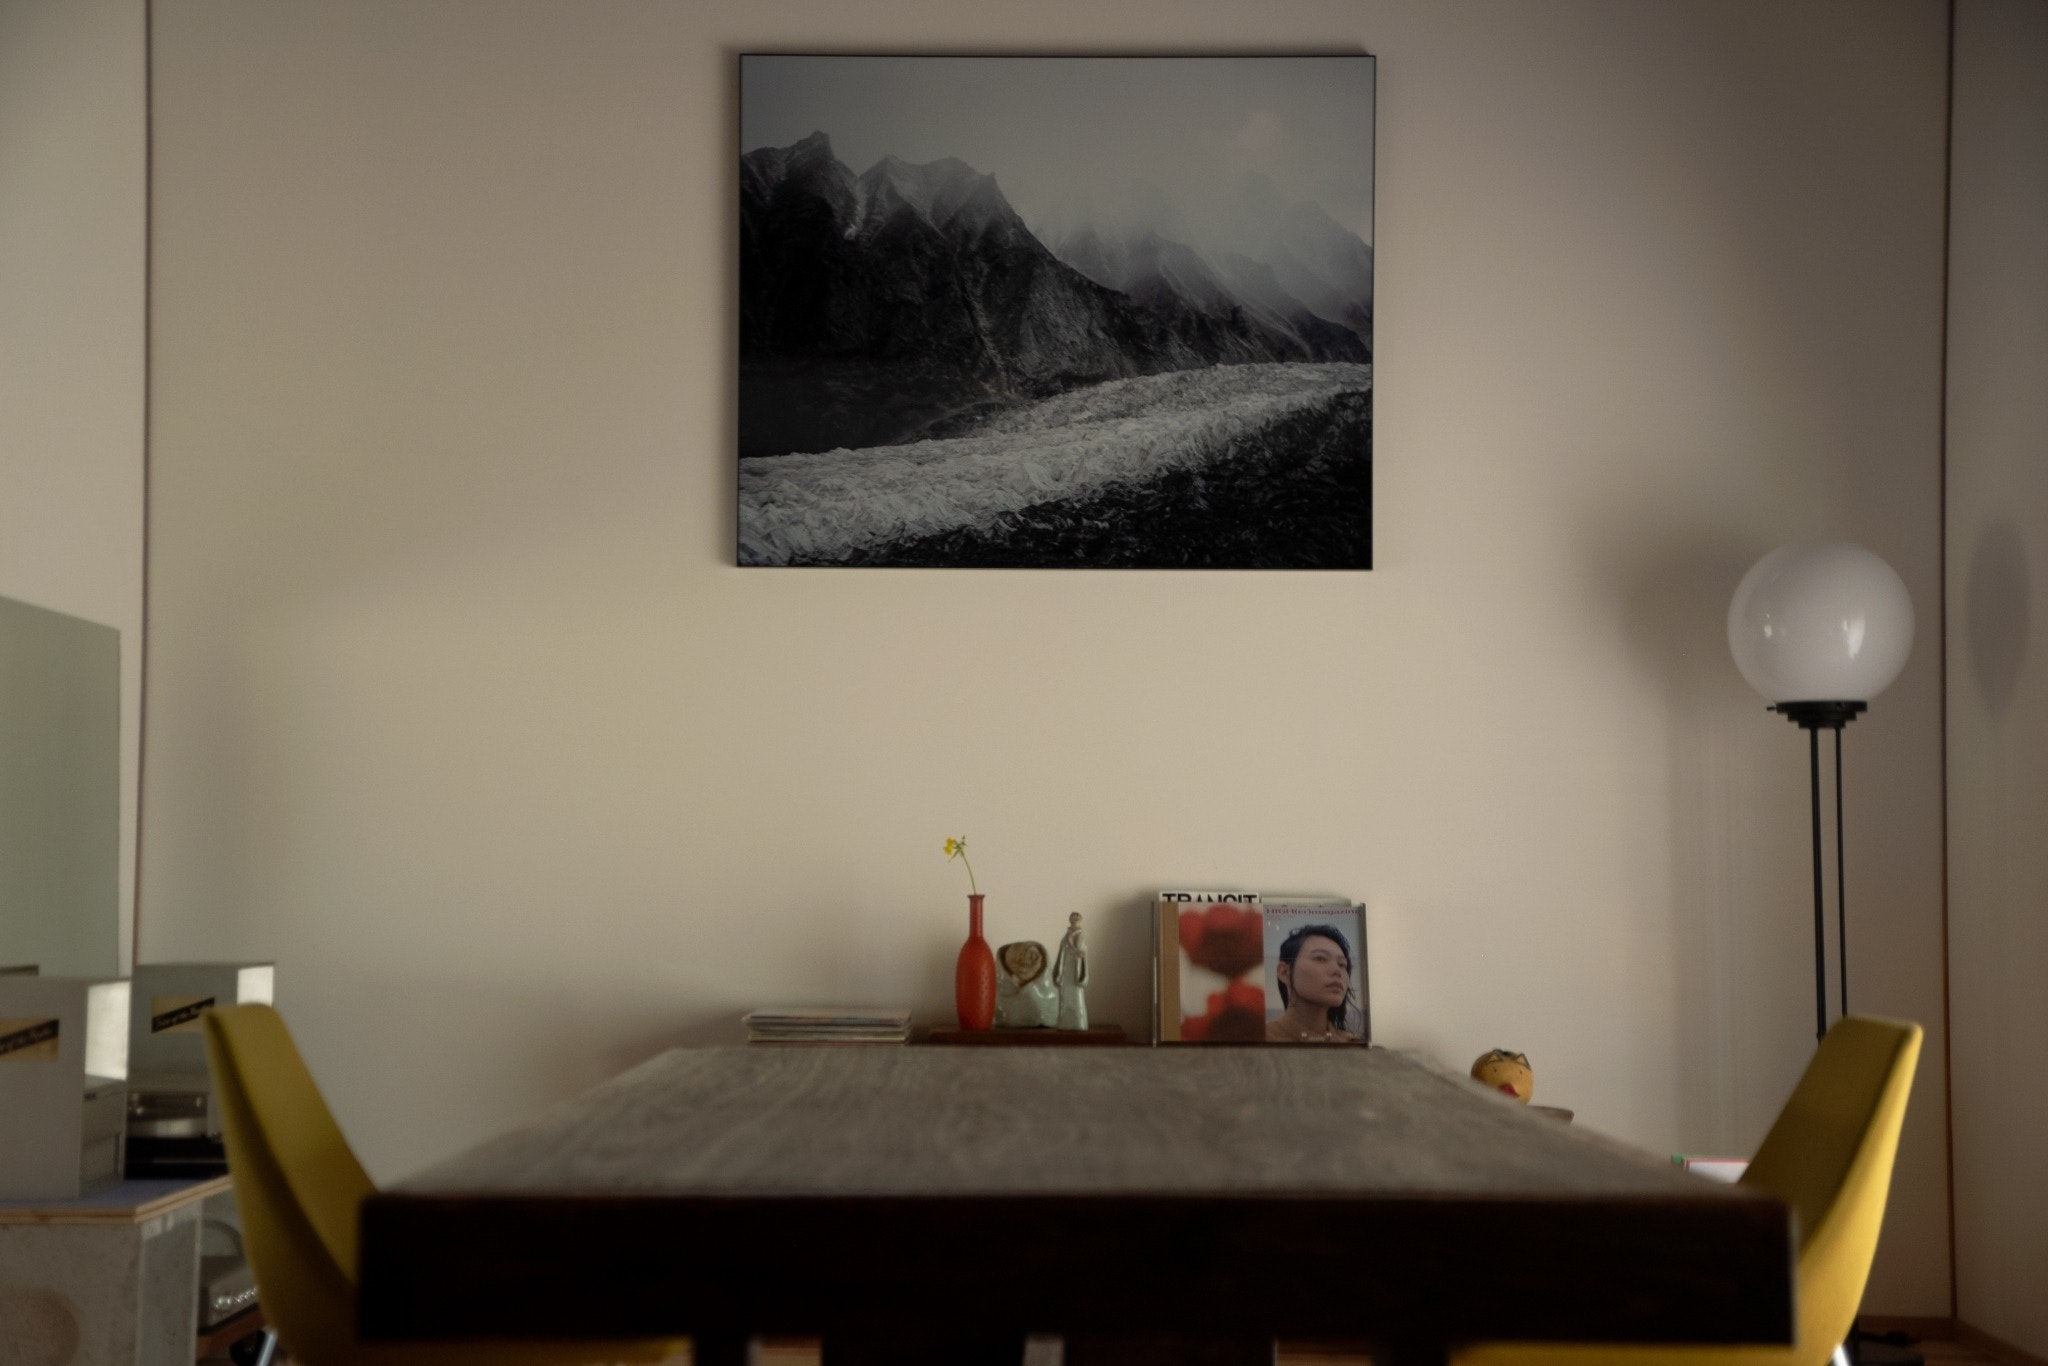 「Art&Stay」をテーマにした古民家一棟貸しの宿です。